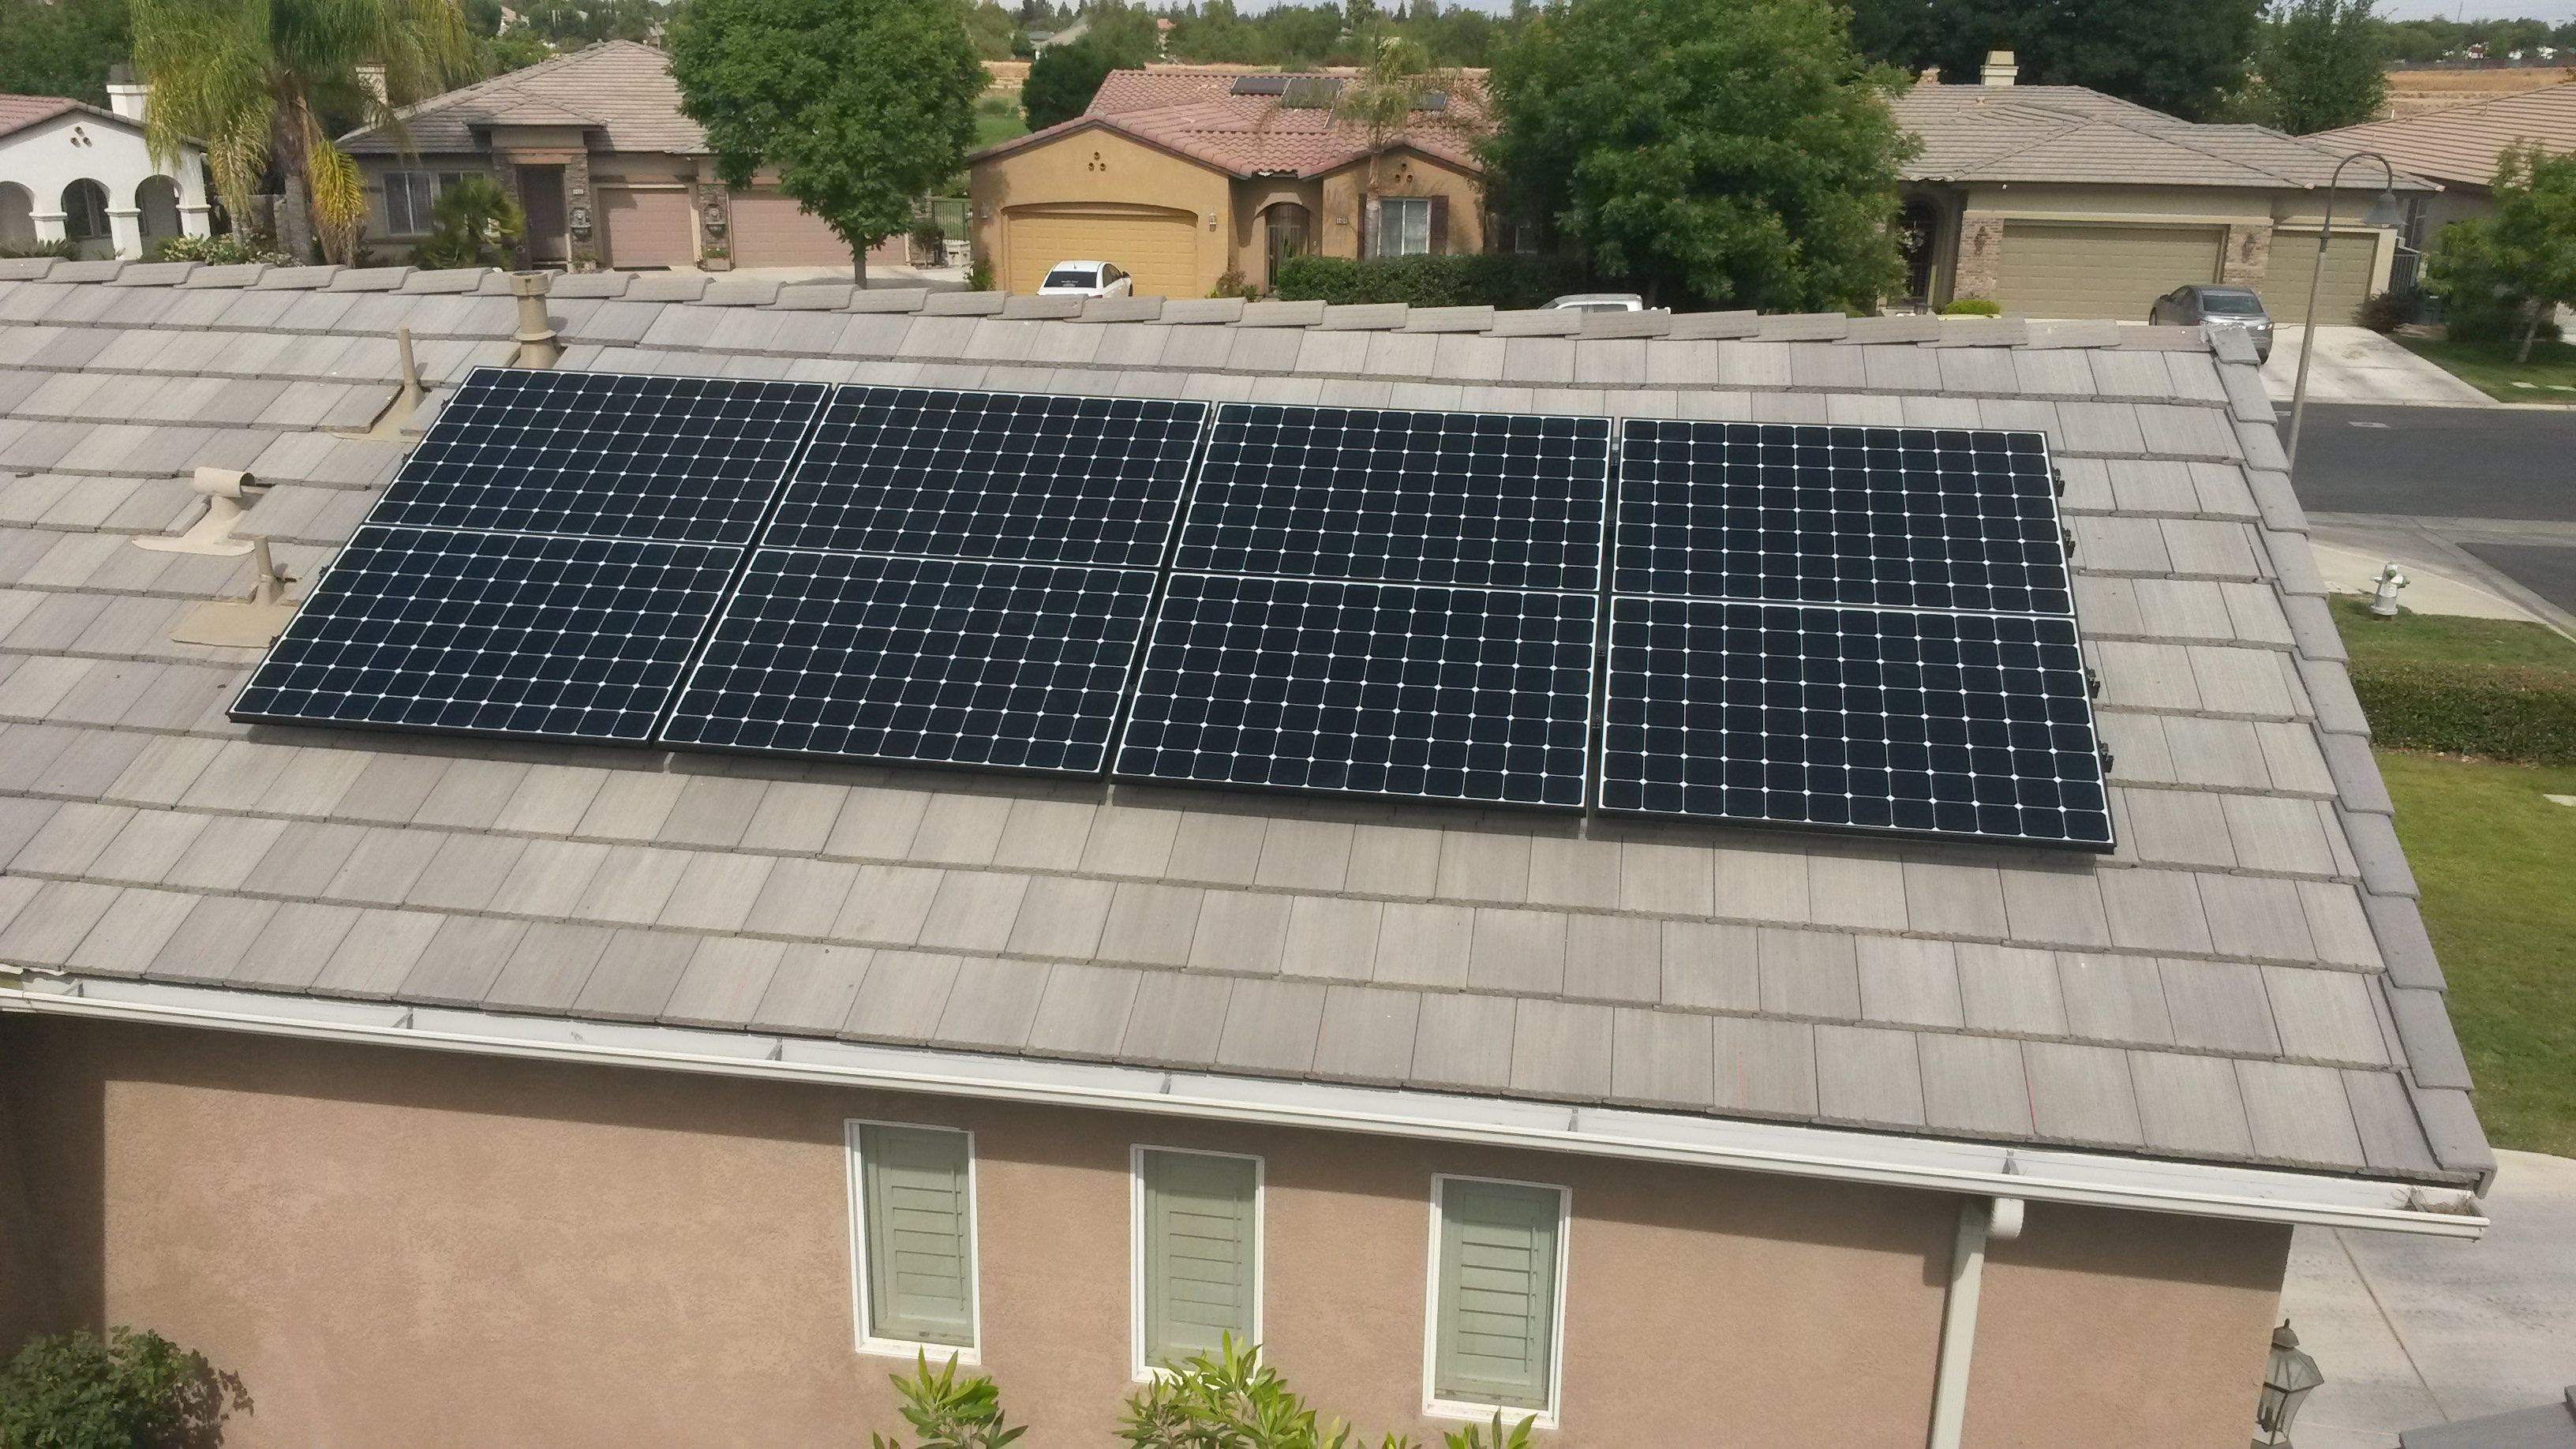 Sunsolarnextdoor Neighborhoodinstallations Residentialsolar Bakersfield Sunpowerelitedealer Bestinstallations Sunpow Residential Solar Solar Installation